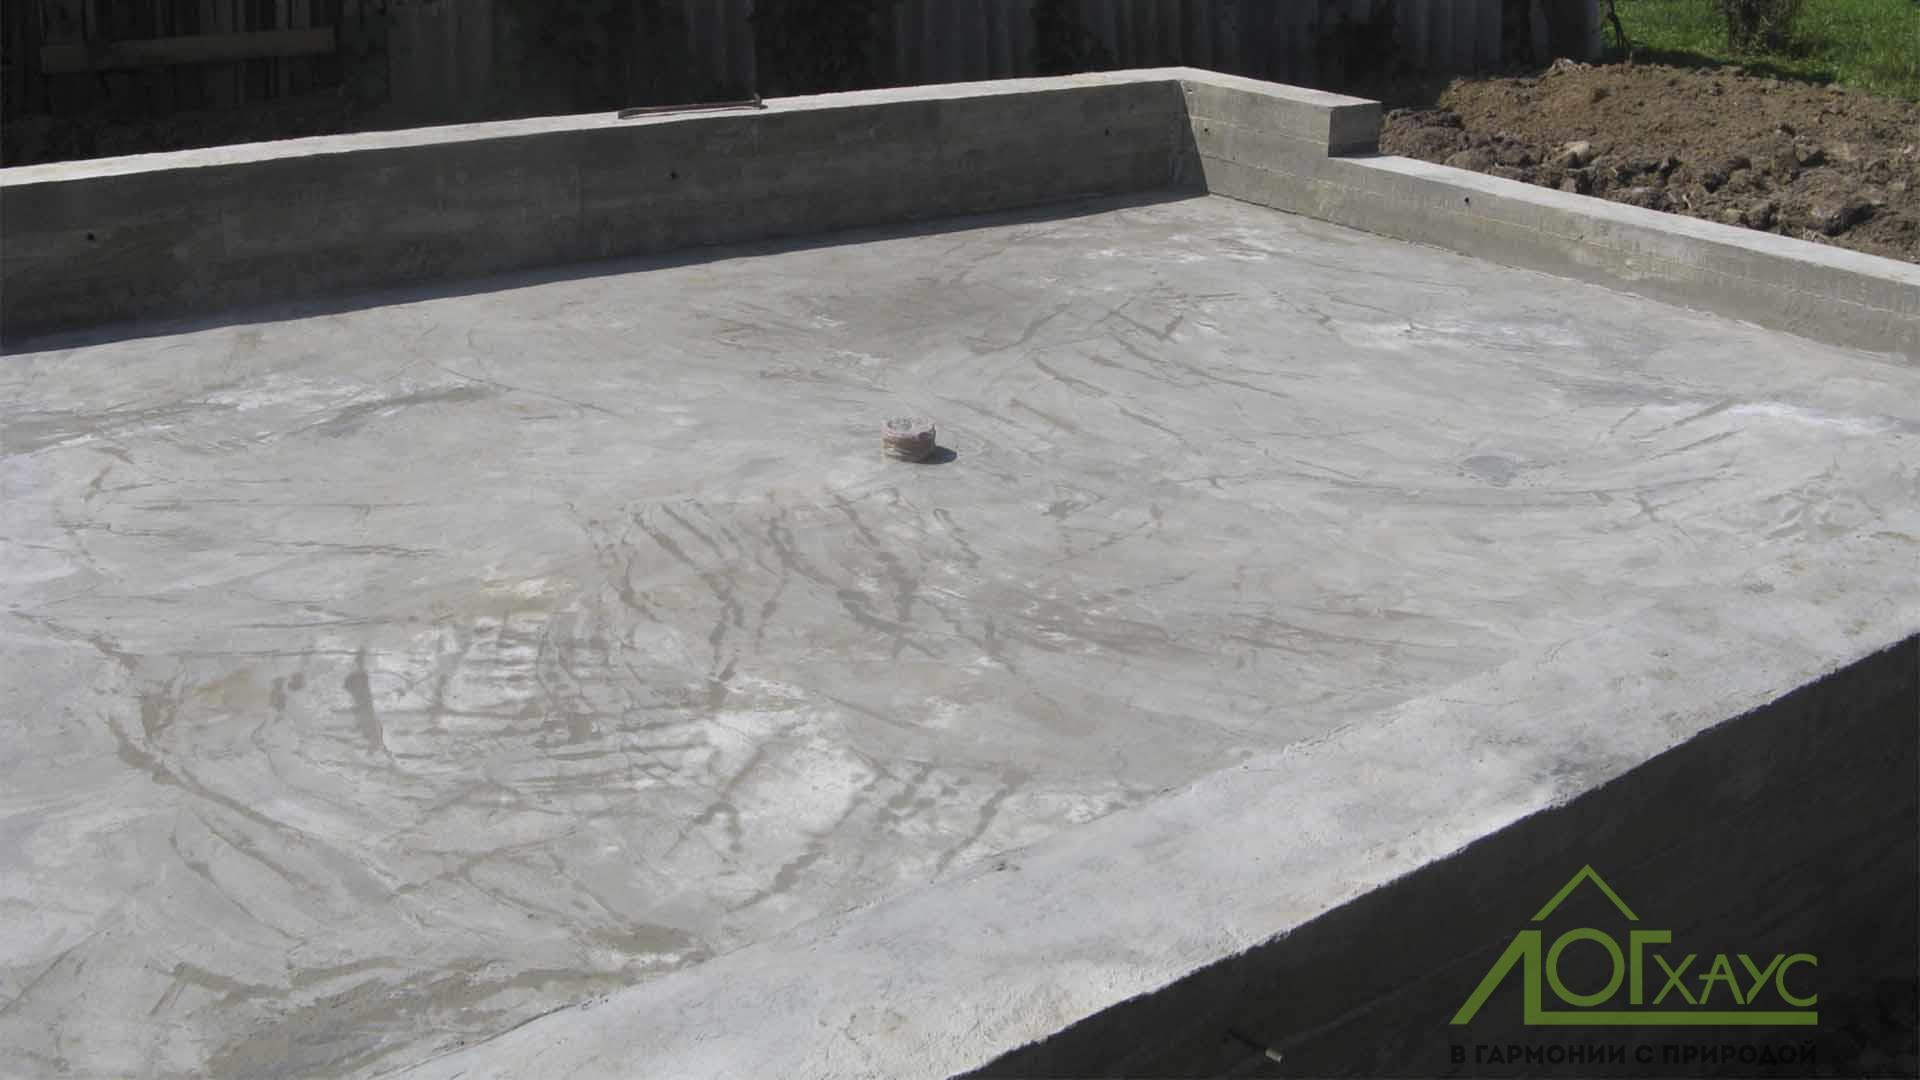 Плита под гараж фундамента